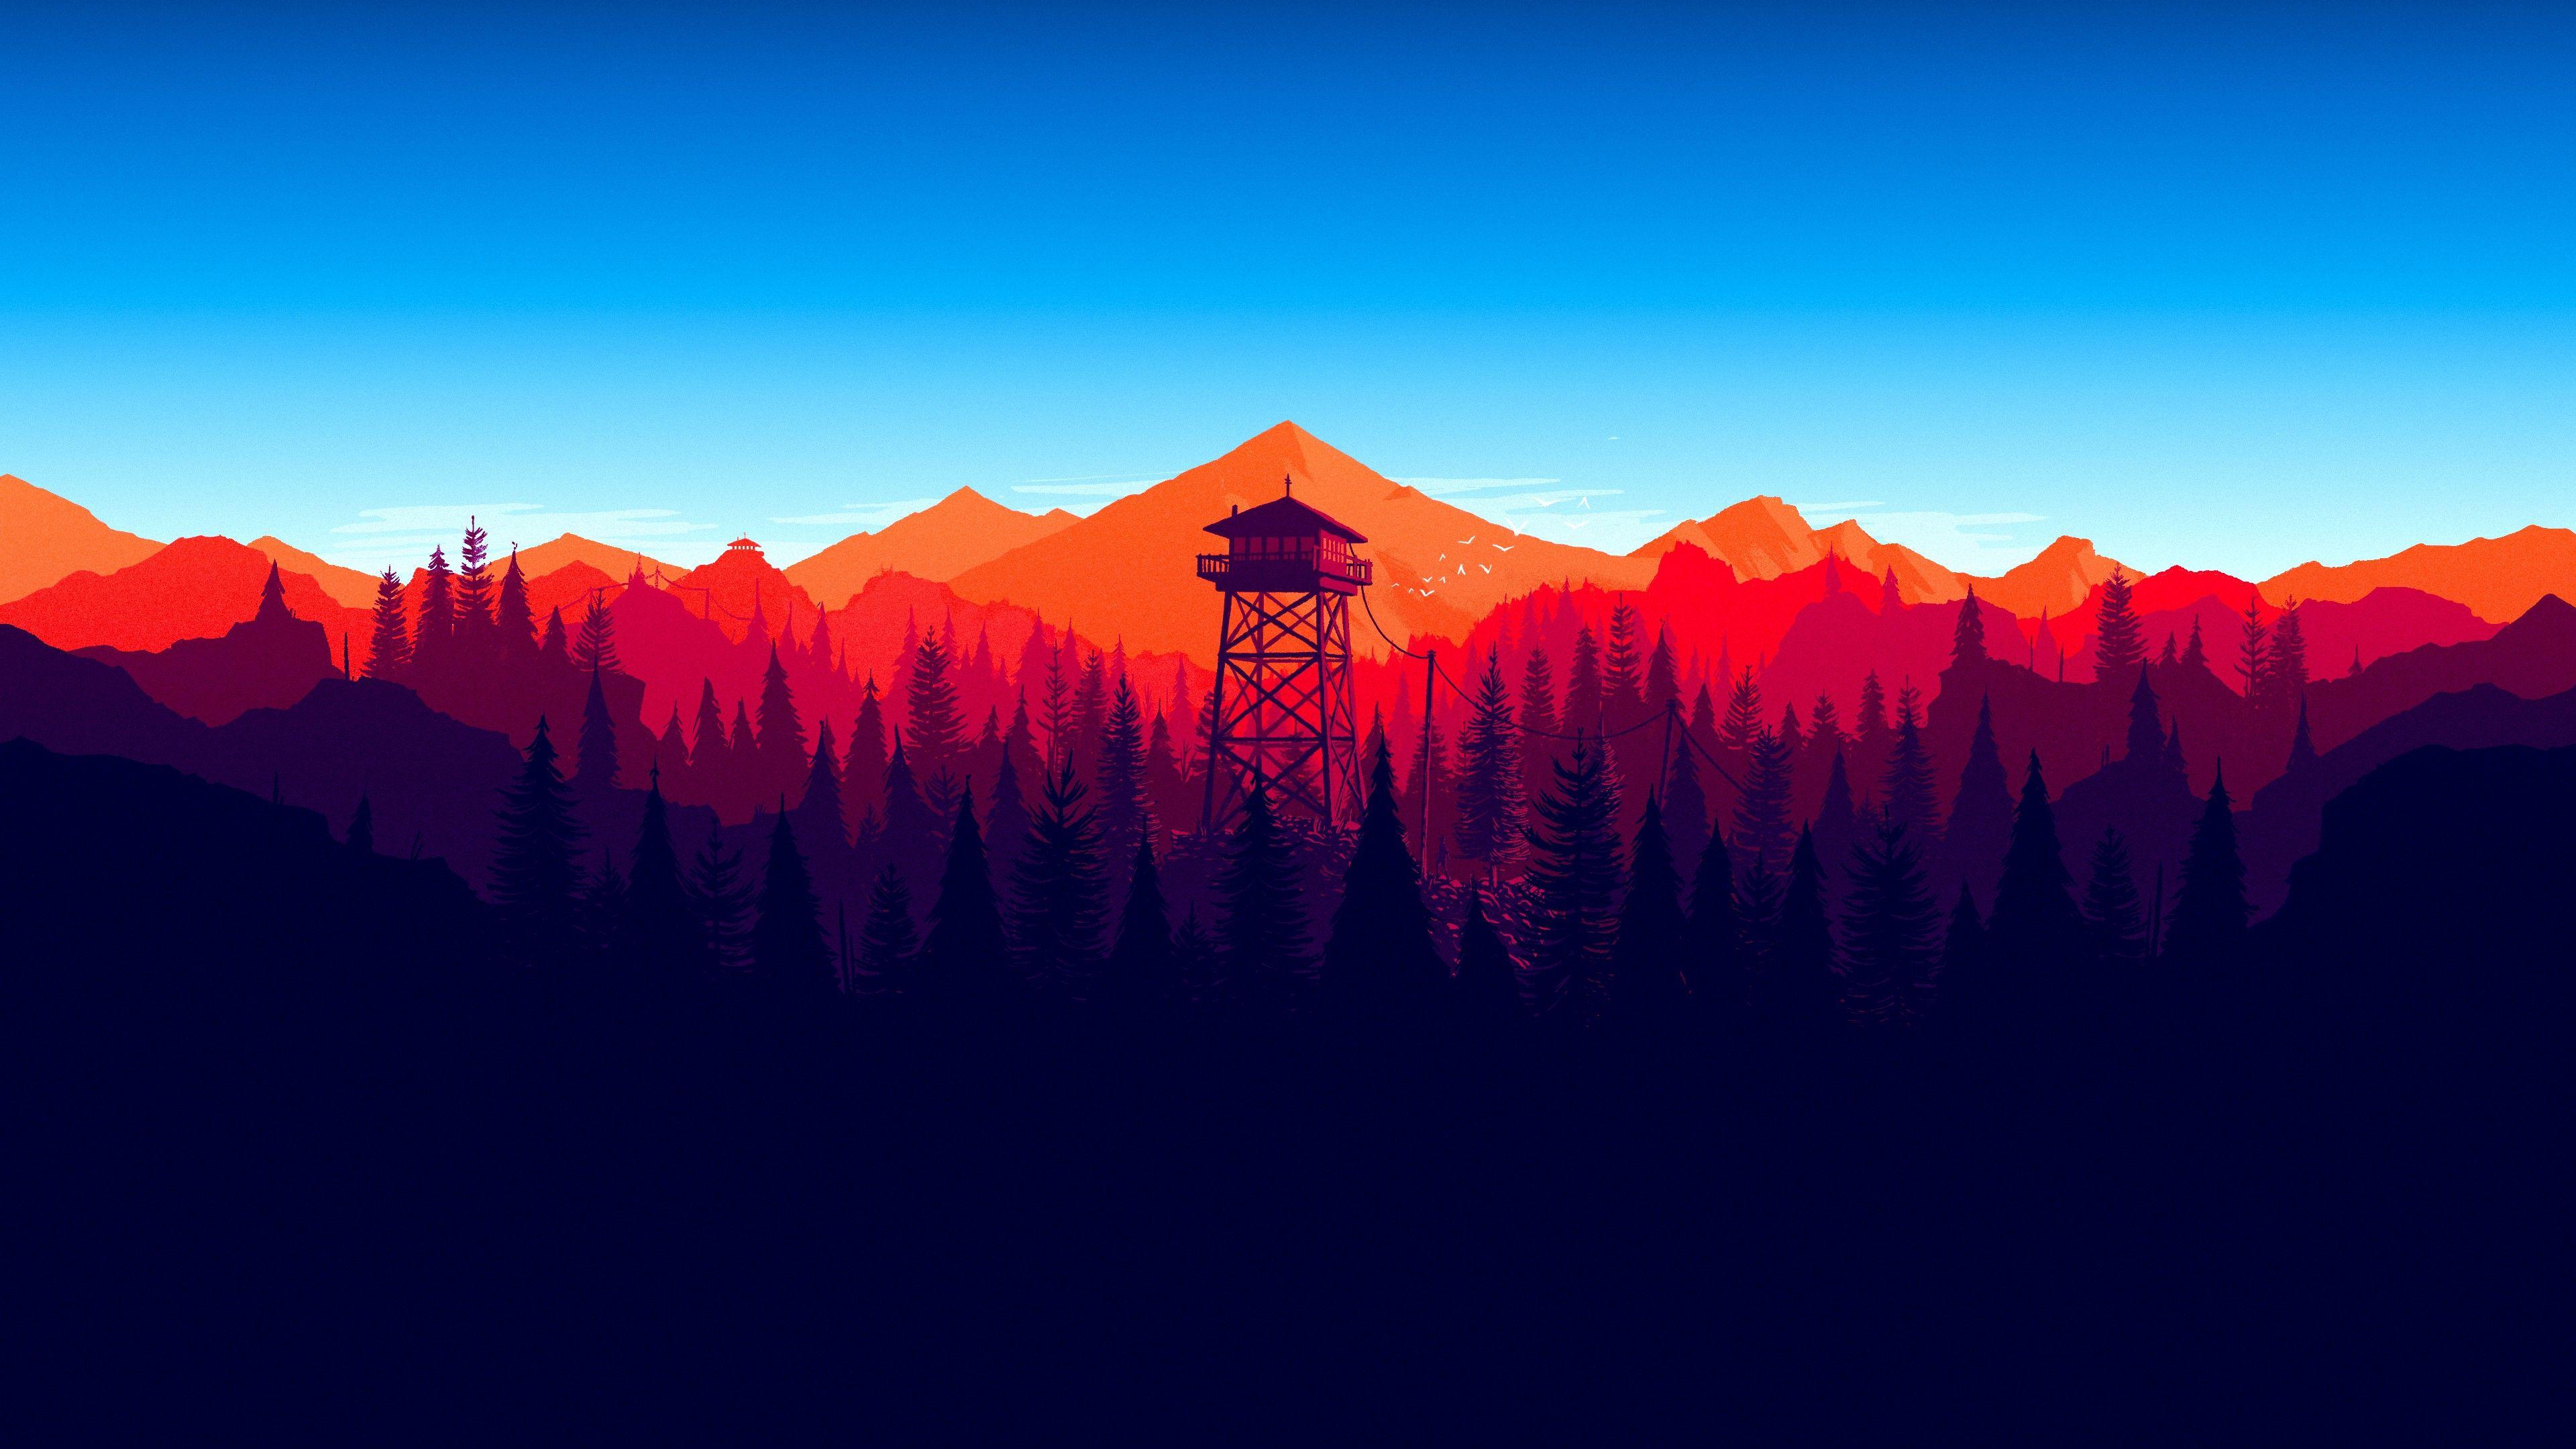 General 3840x2160 Mountains Minimalism Forest Firewatch Desktop Wallpaper Art Minimal Wallpaper Minimalist Wallpaper